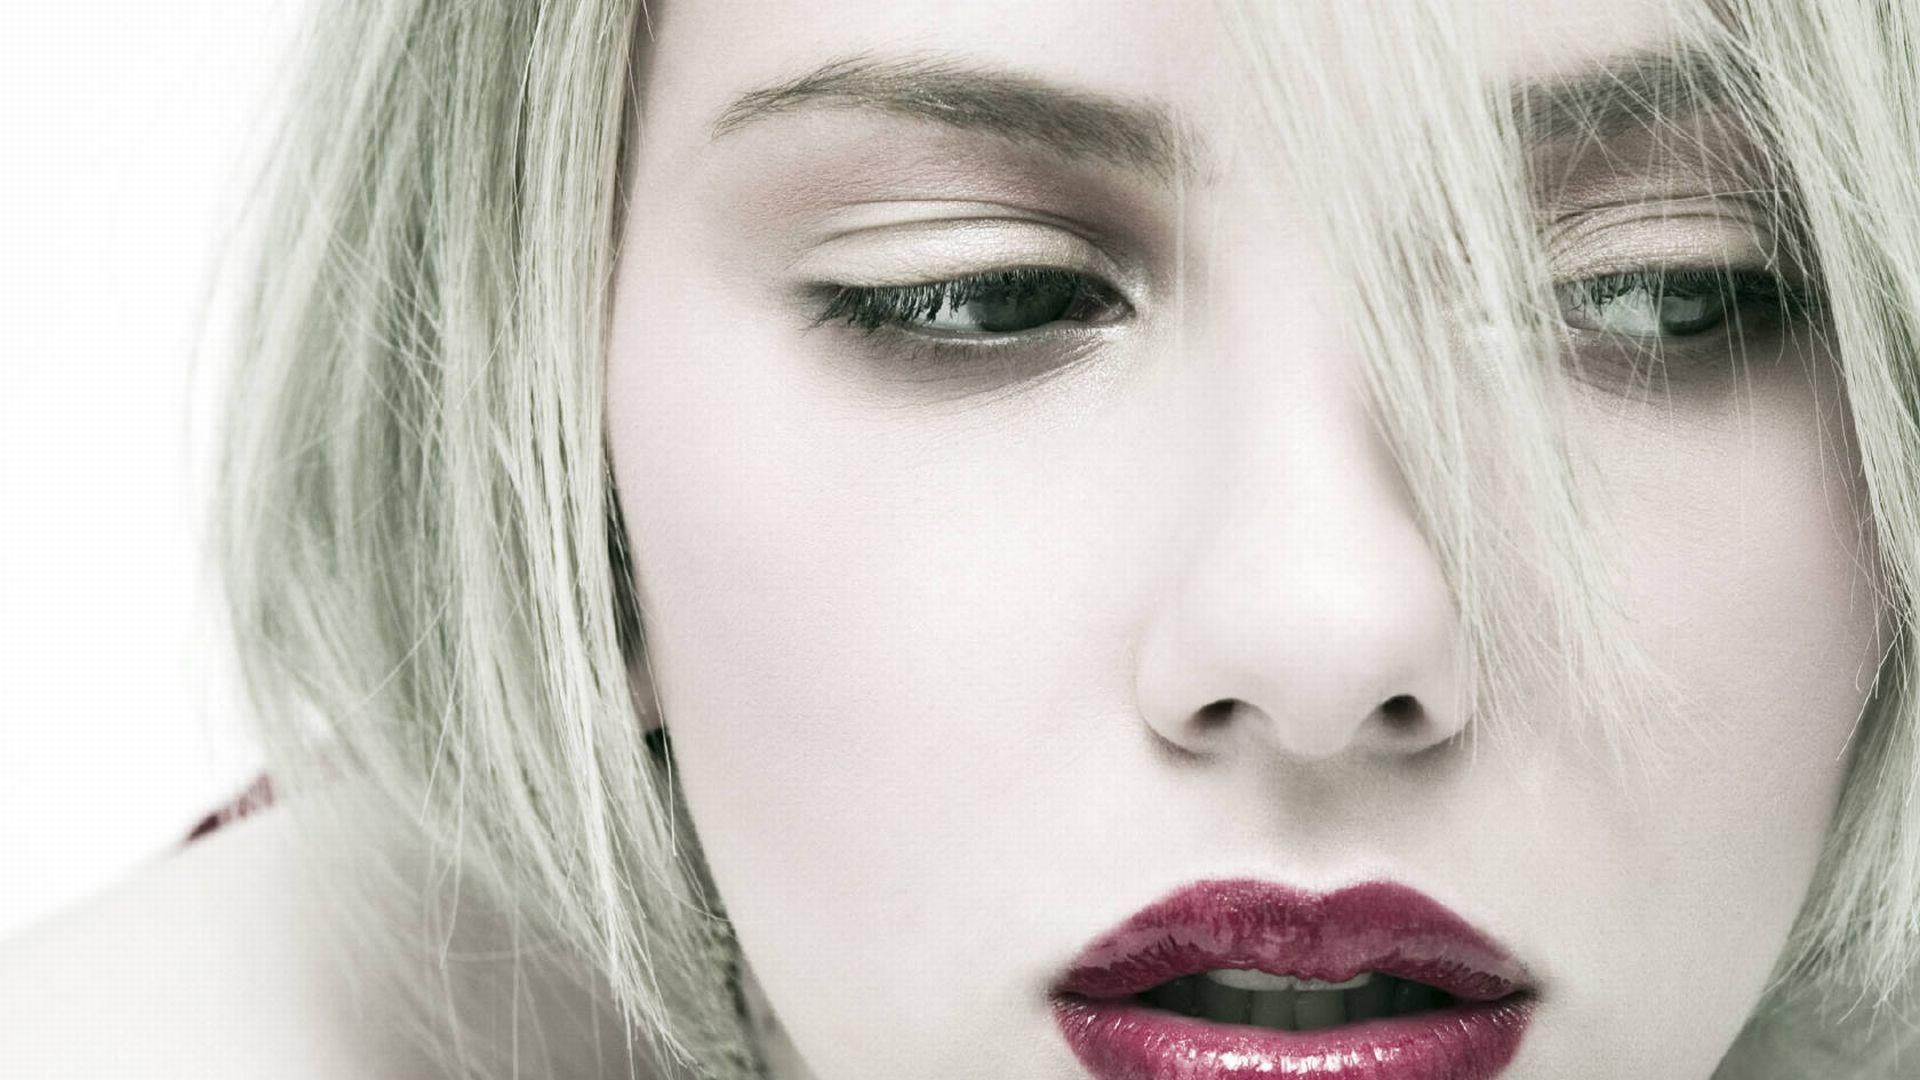 Scarlett Johansson Wallpapers 4